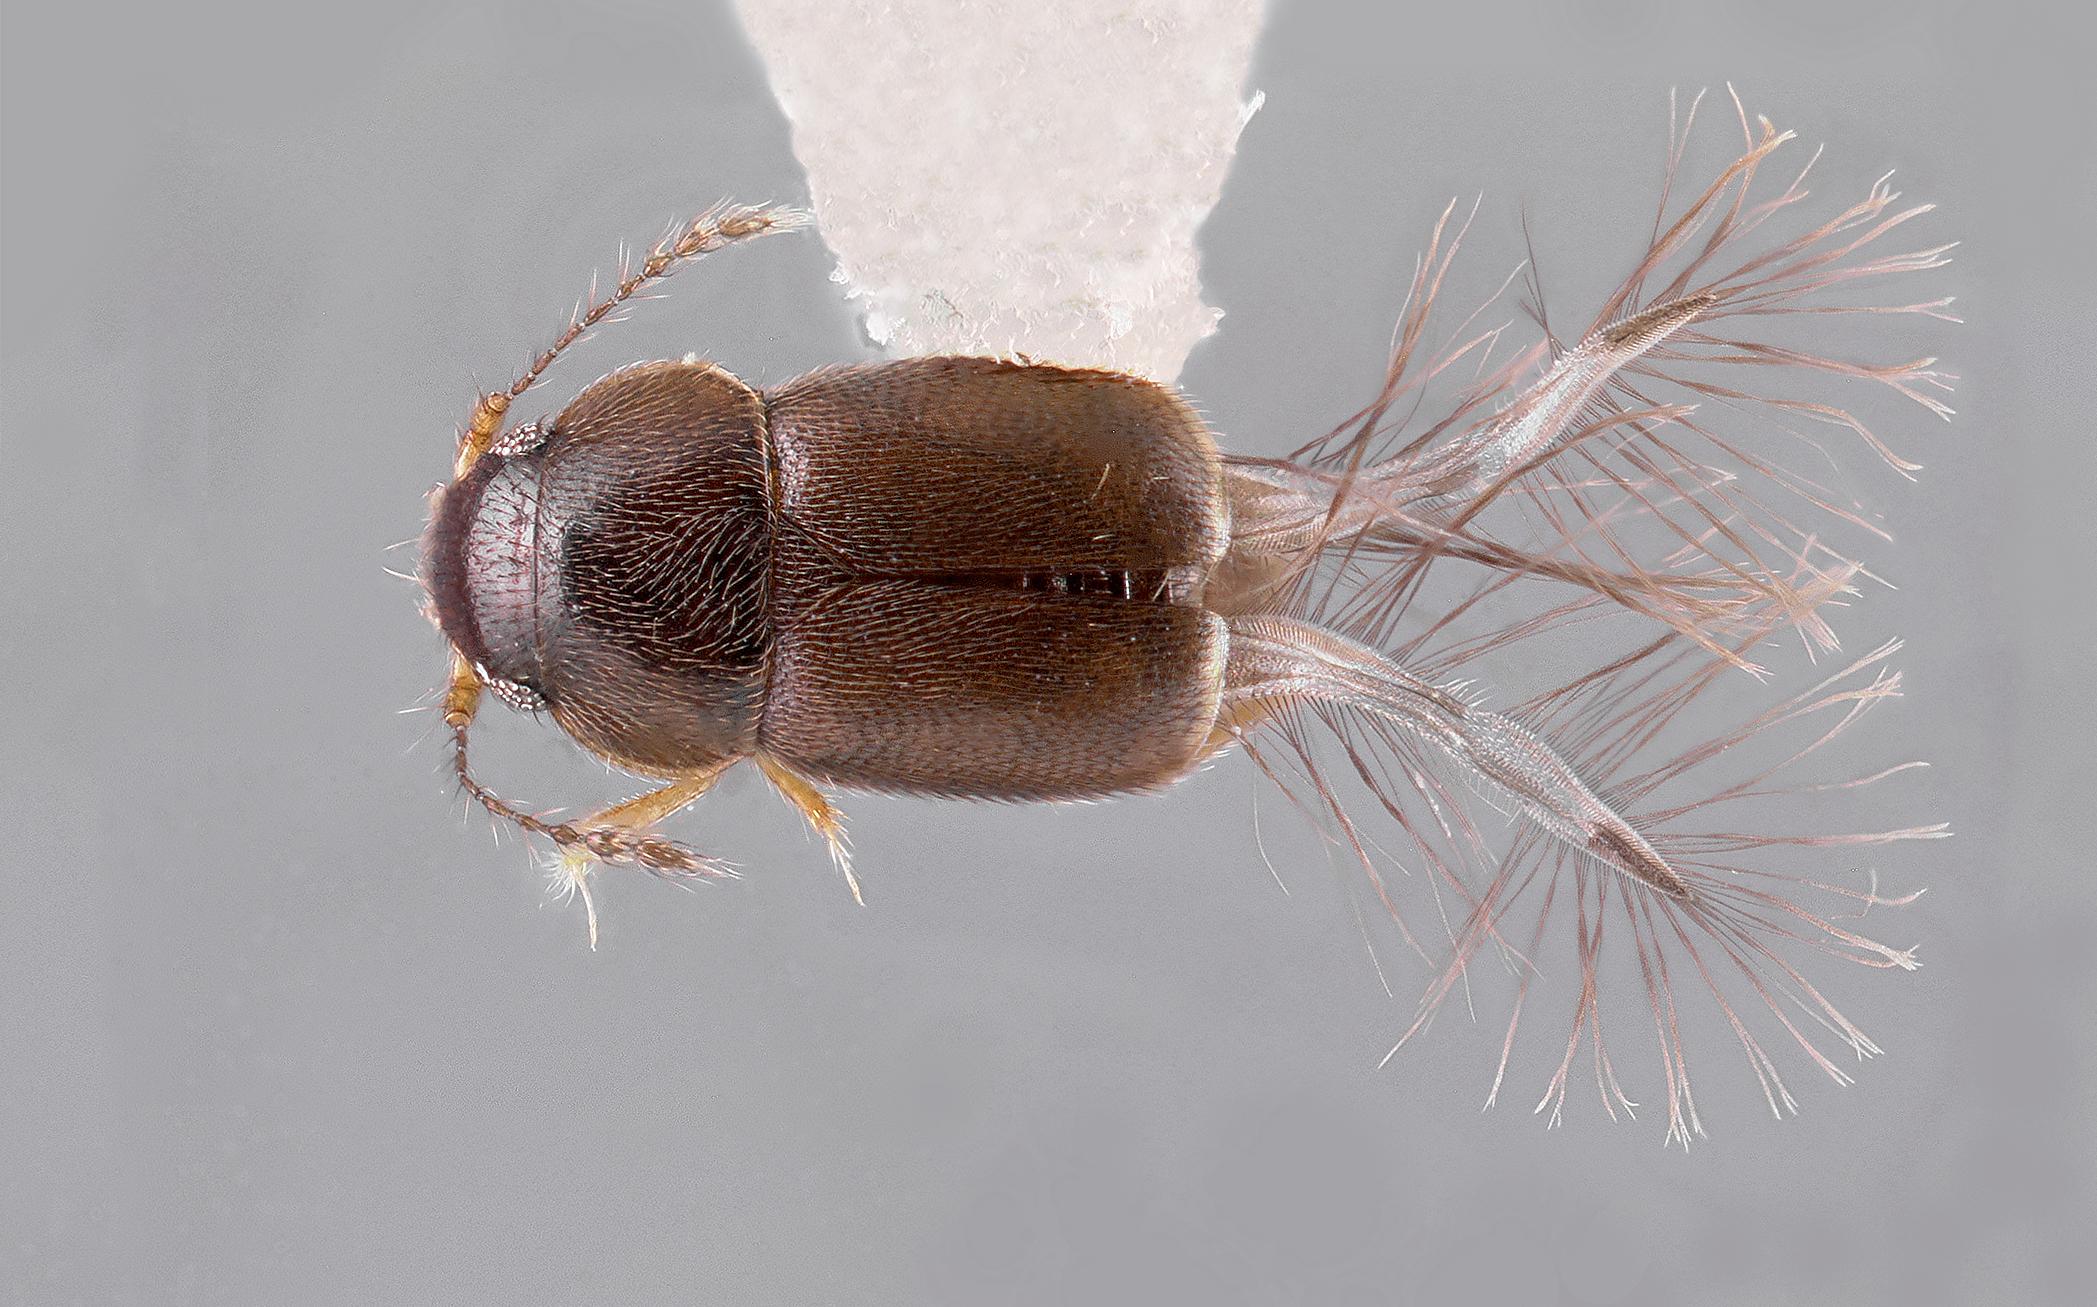 Featherwing beetle image work in progress.